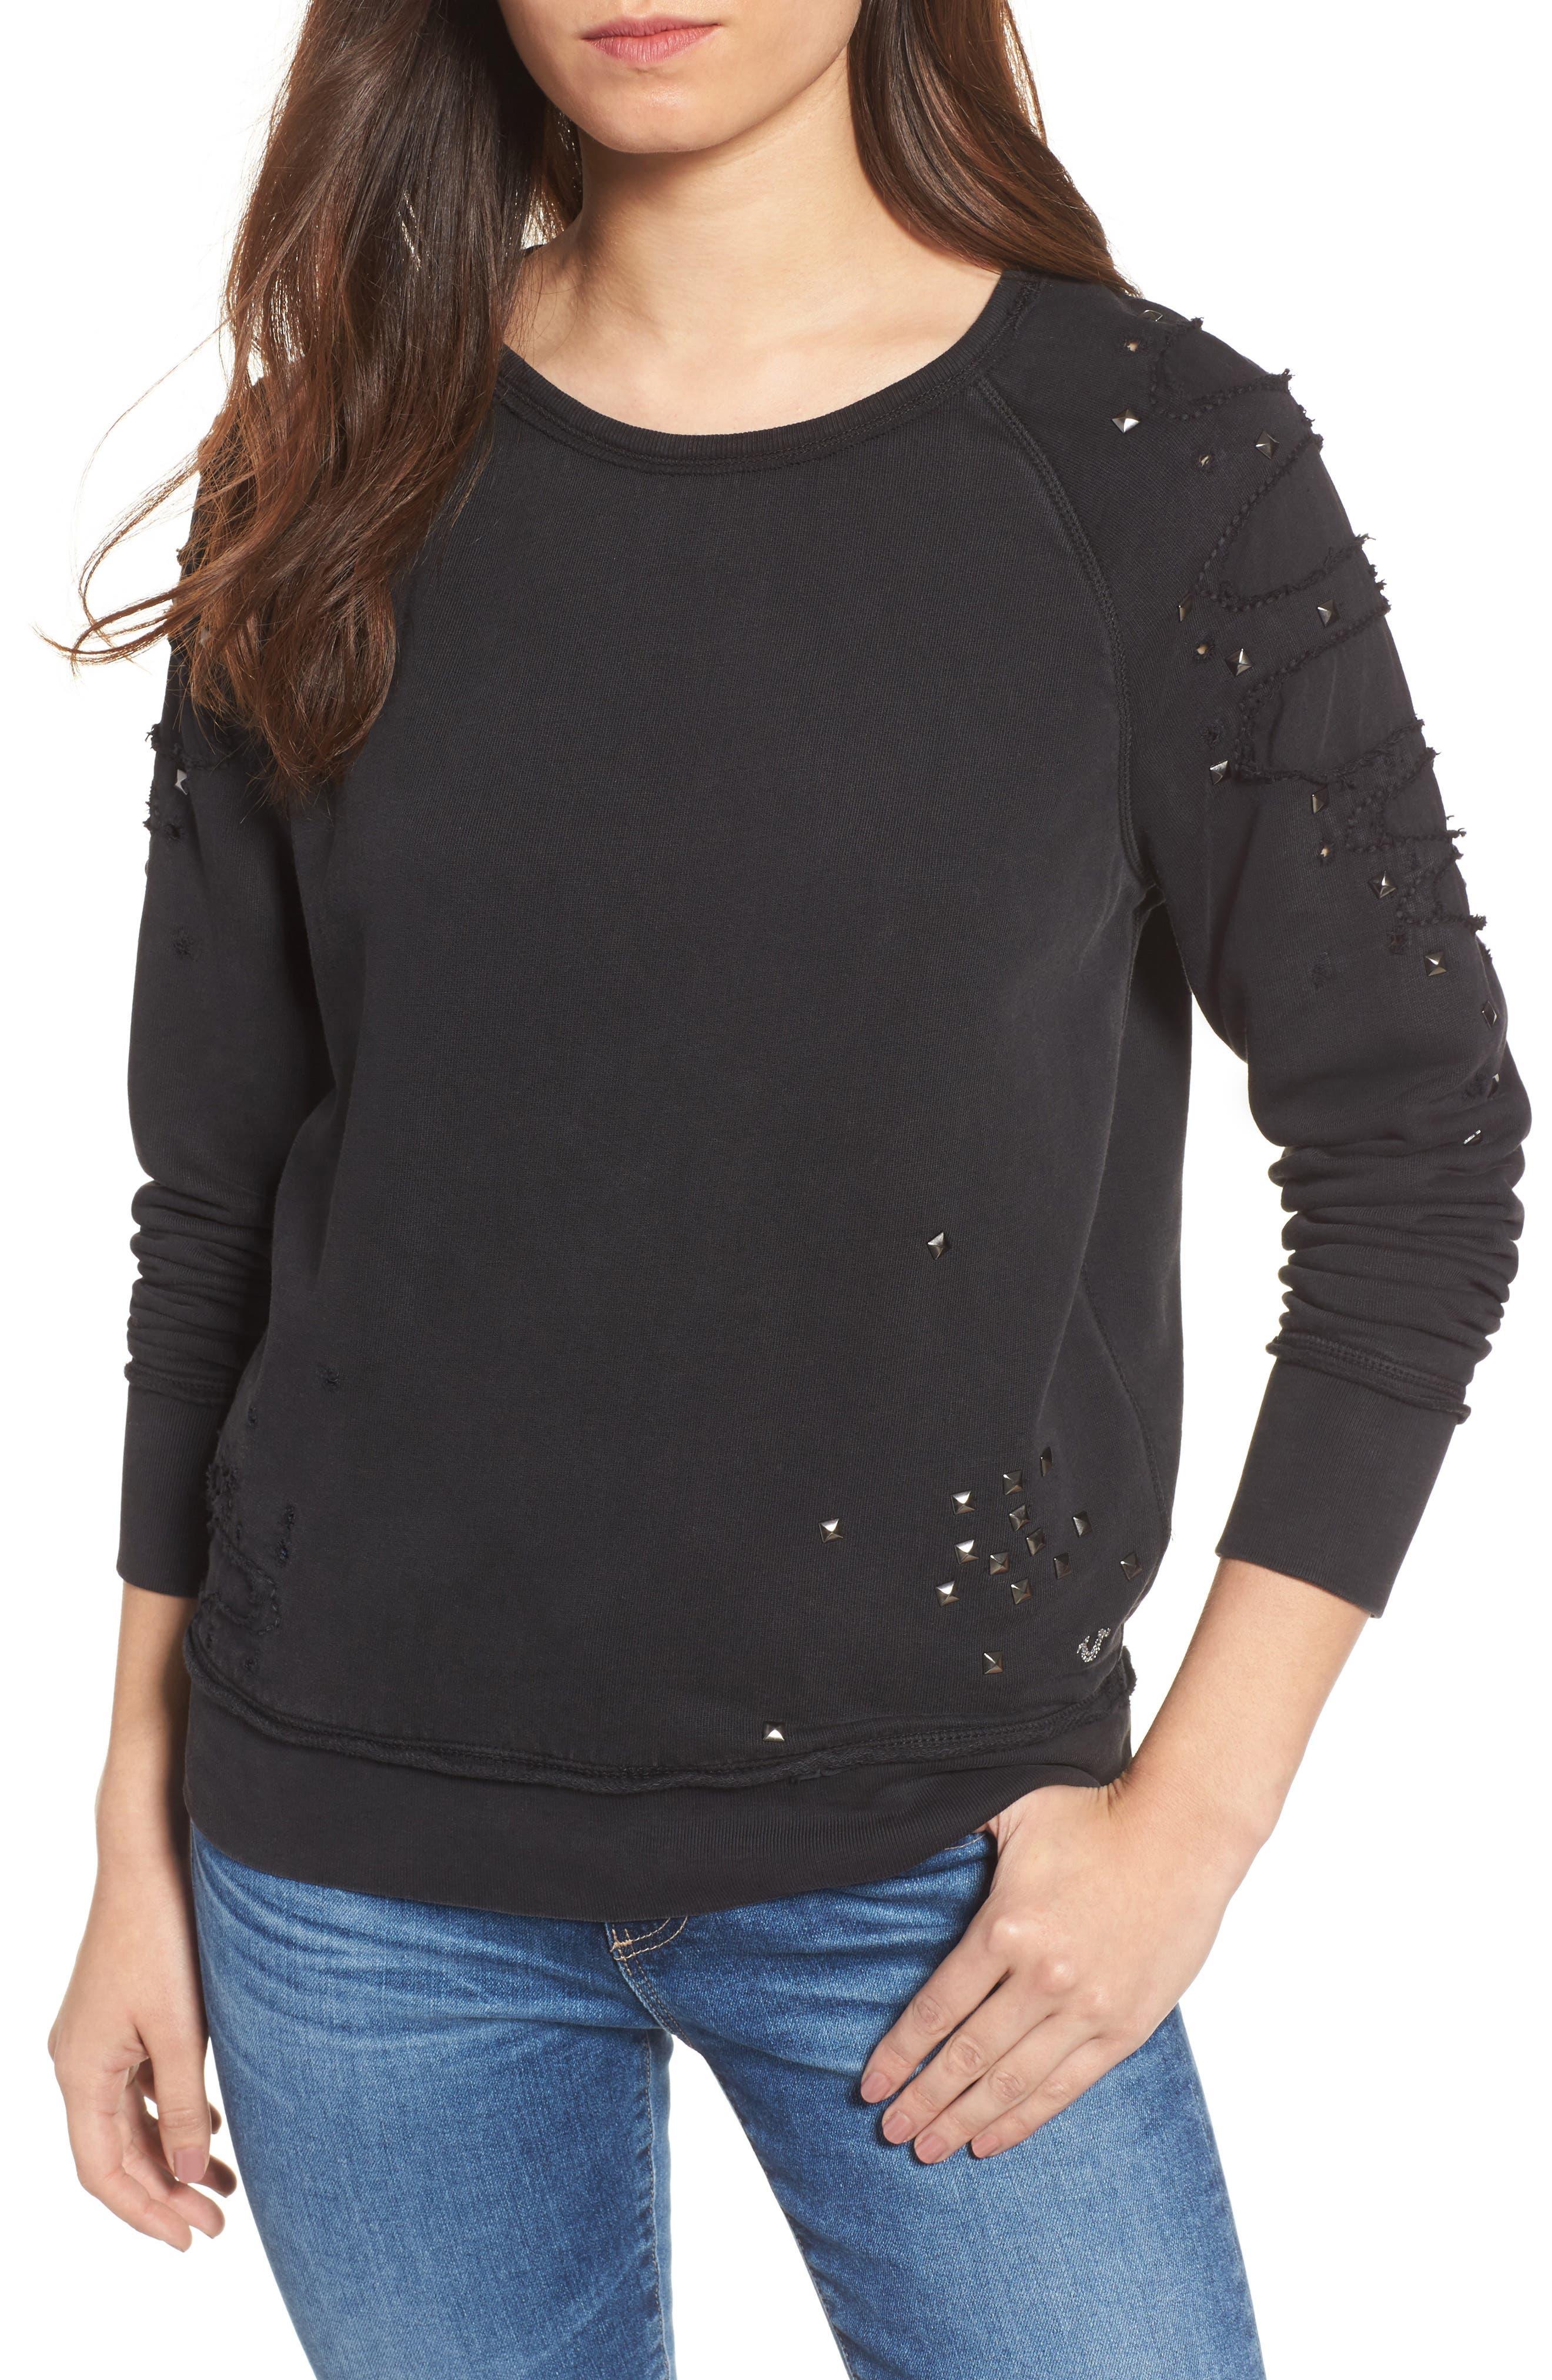 Distressed Boyfriend Sweatshirt,                             Main thumbnail 1, color,                             Black